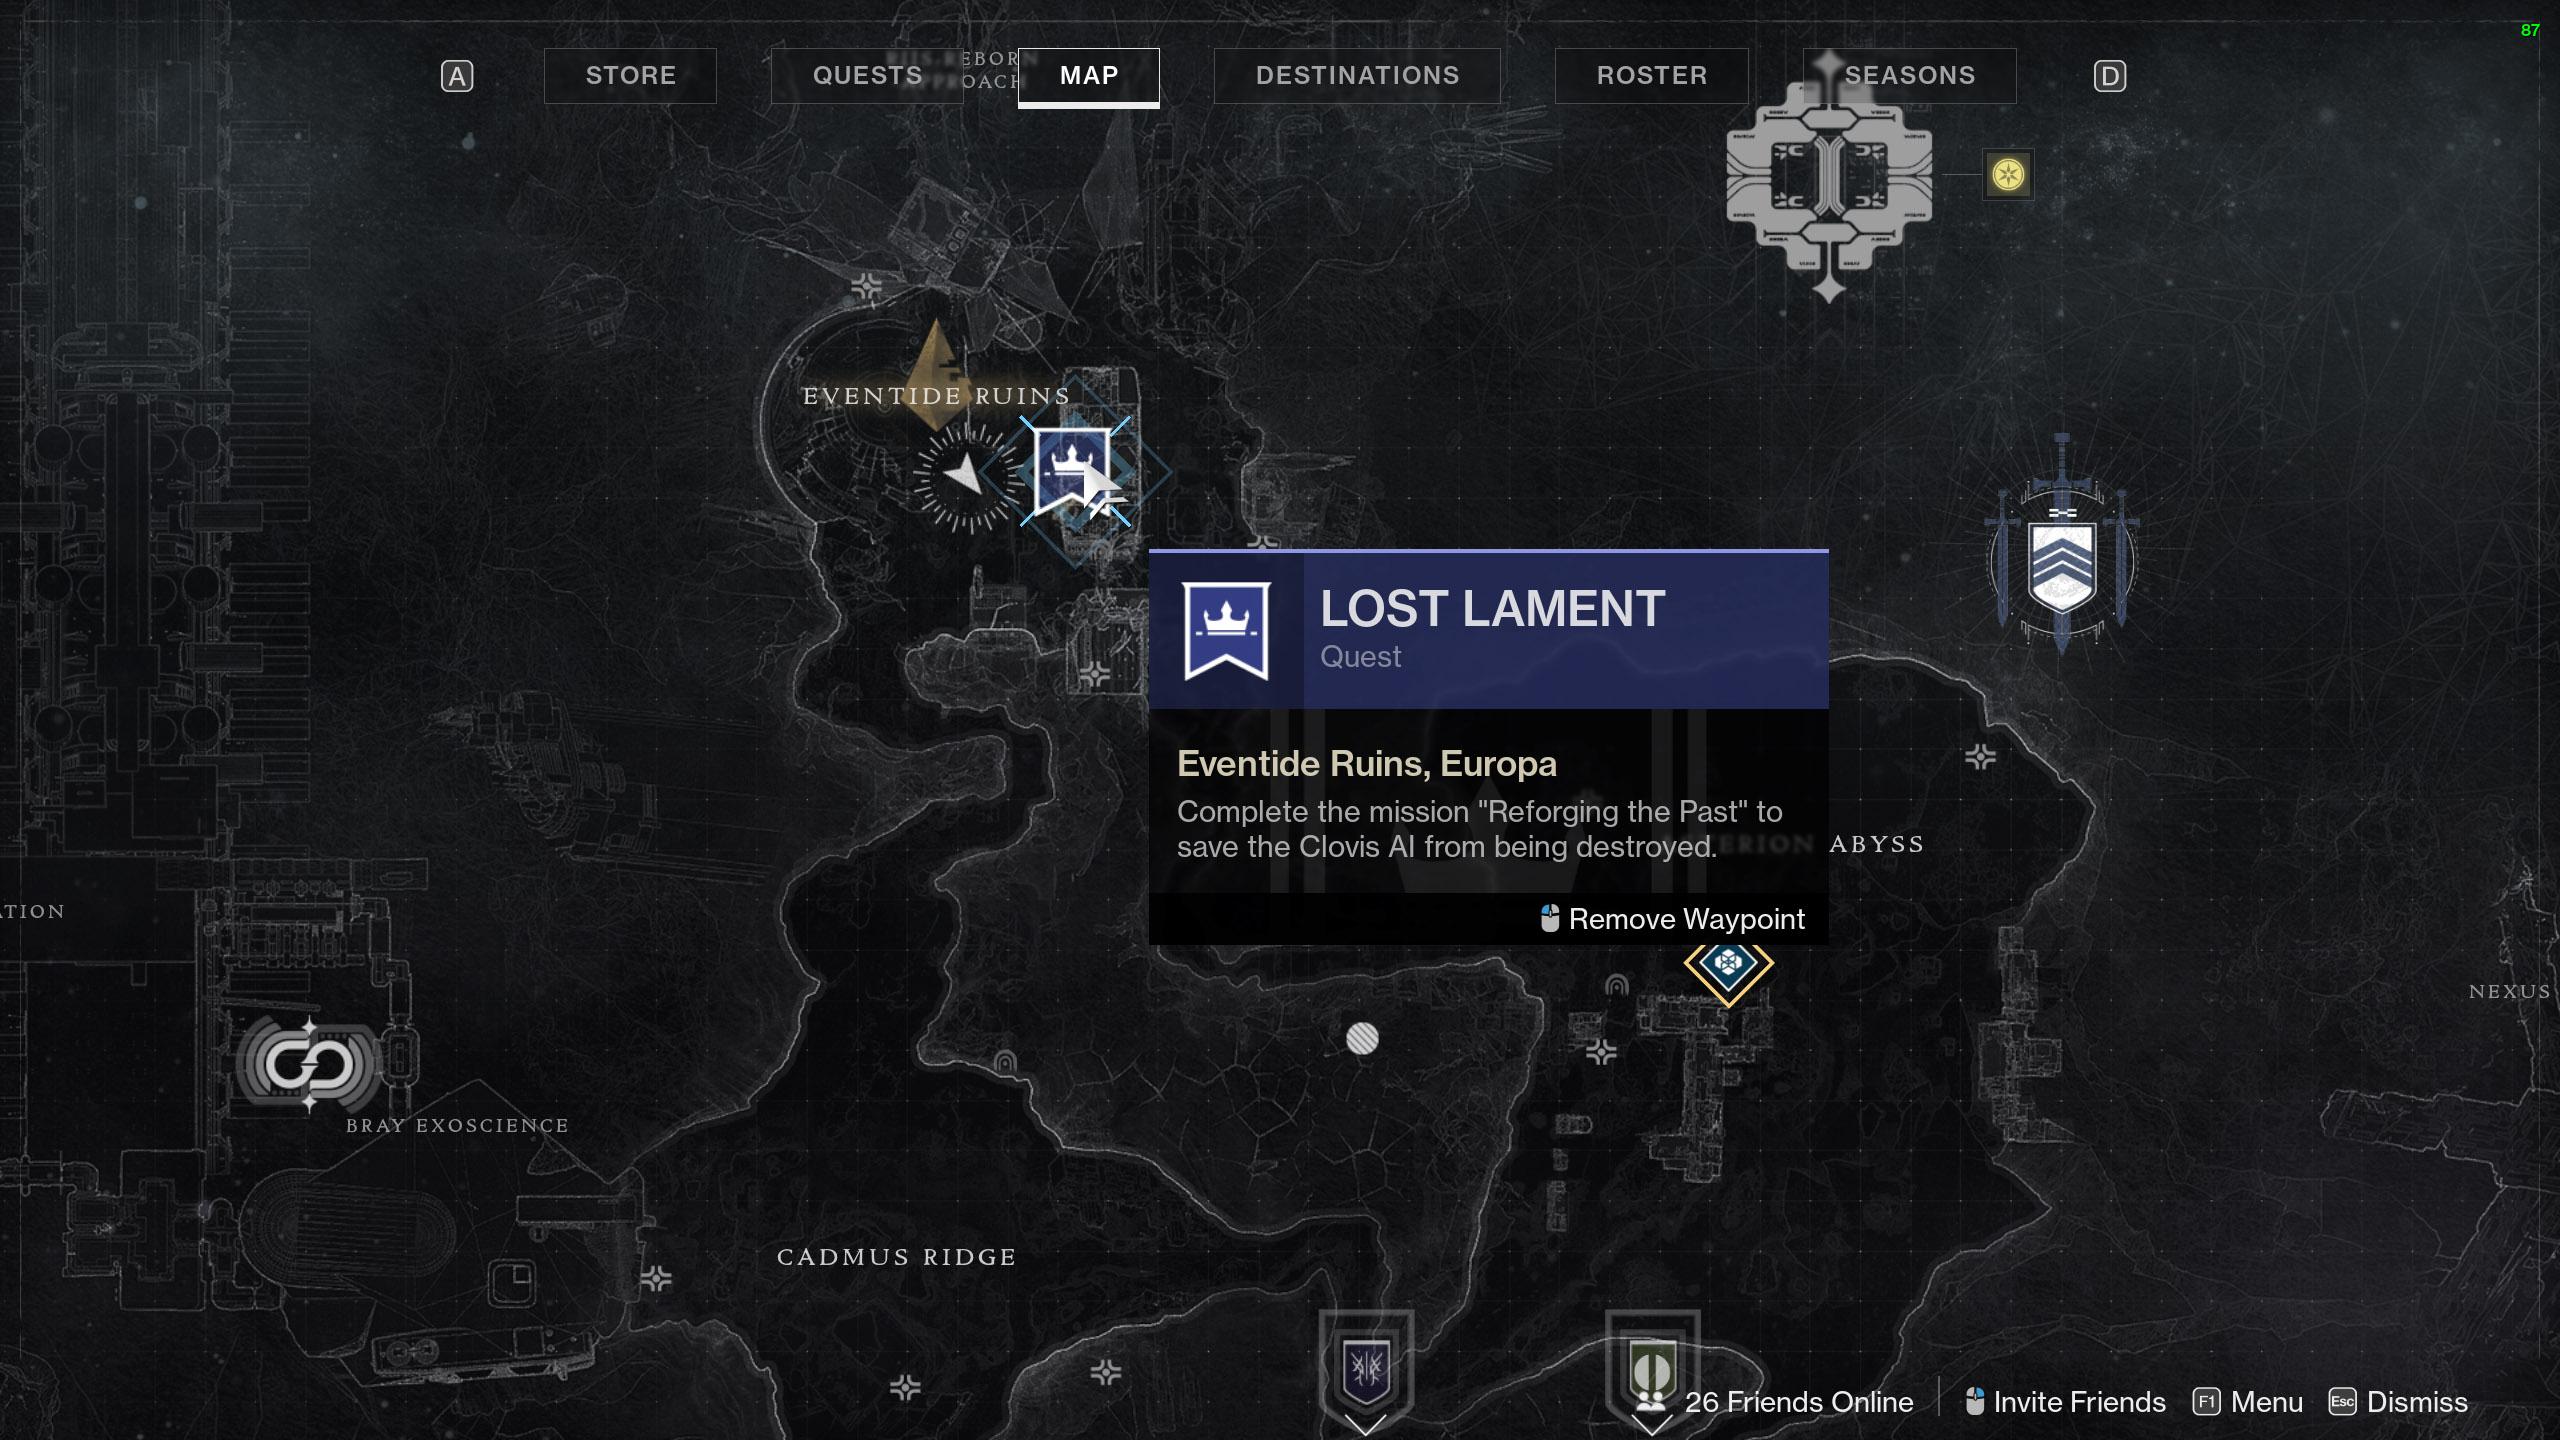 destiny 2 lost lament reforging the past